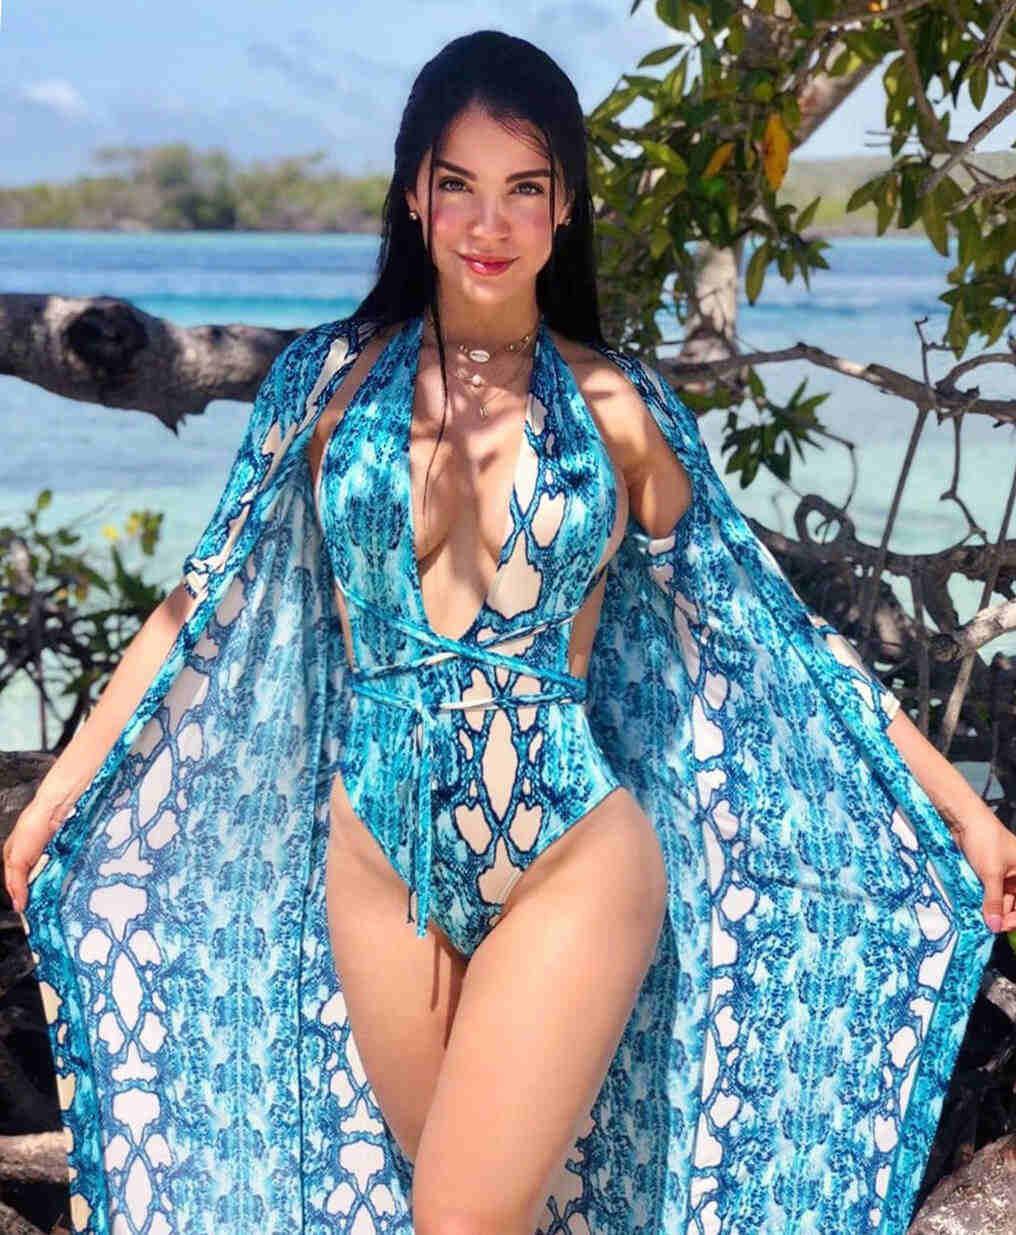 Hot venezuelan babes